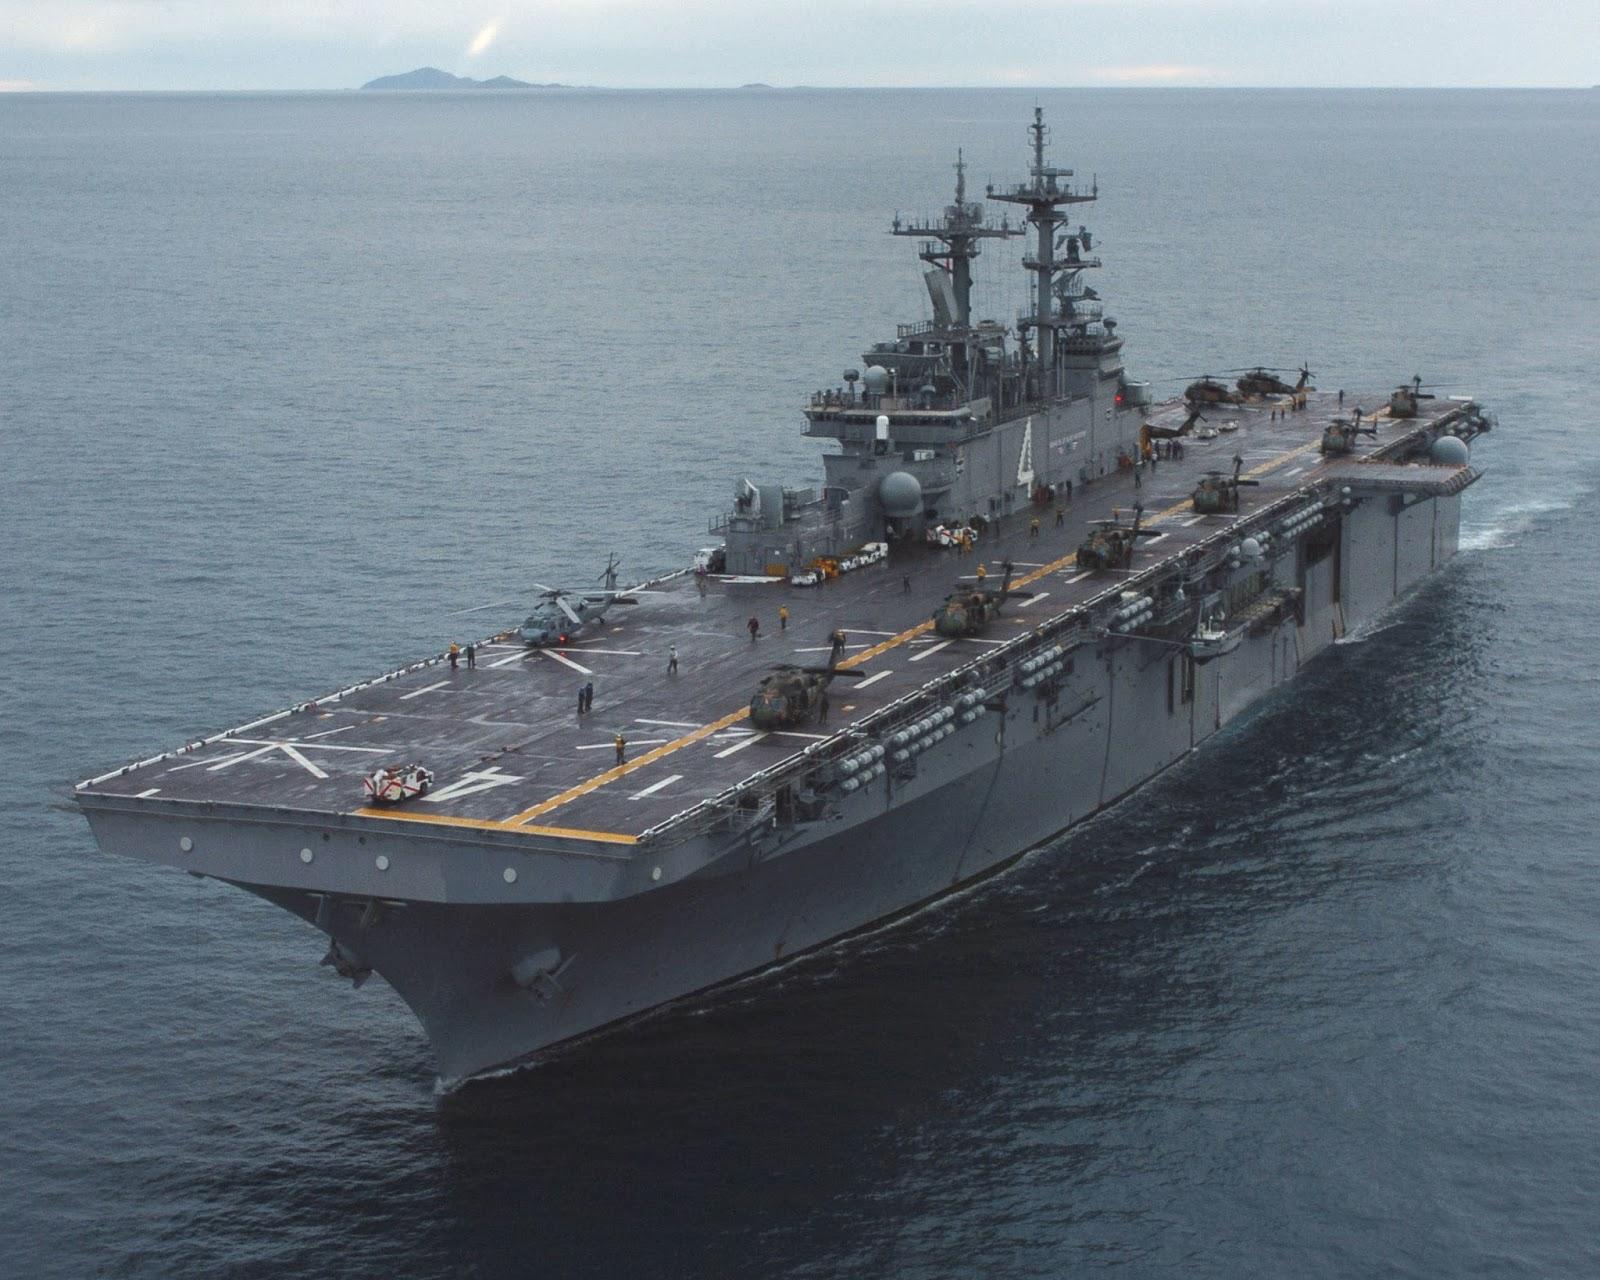 Amerika Serikat Mengirim Pasukan Marinir ke Yaman